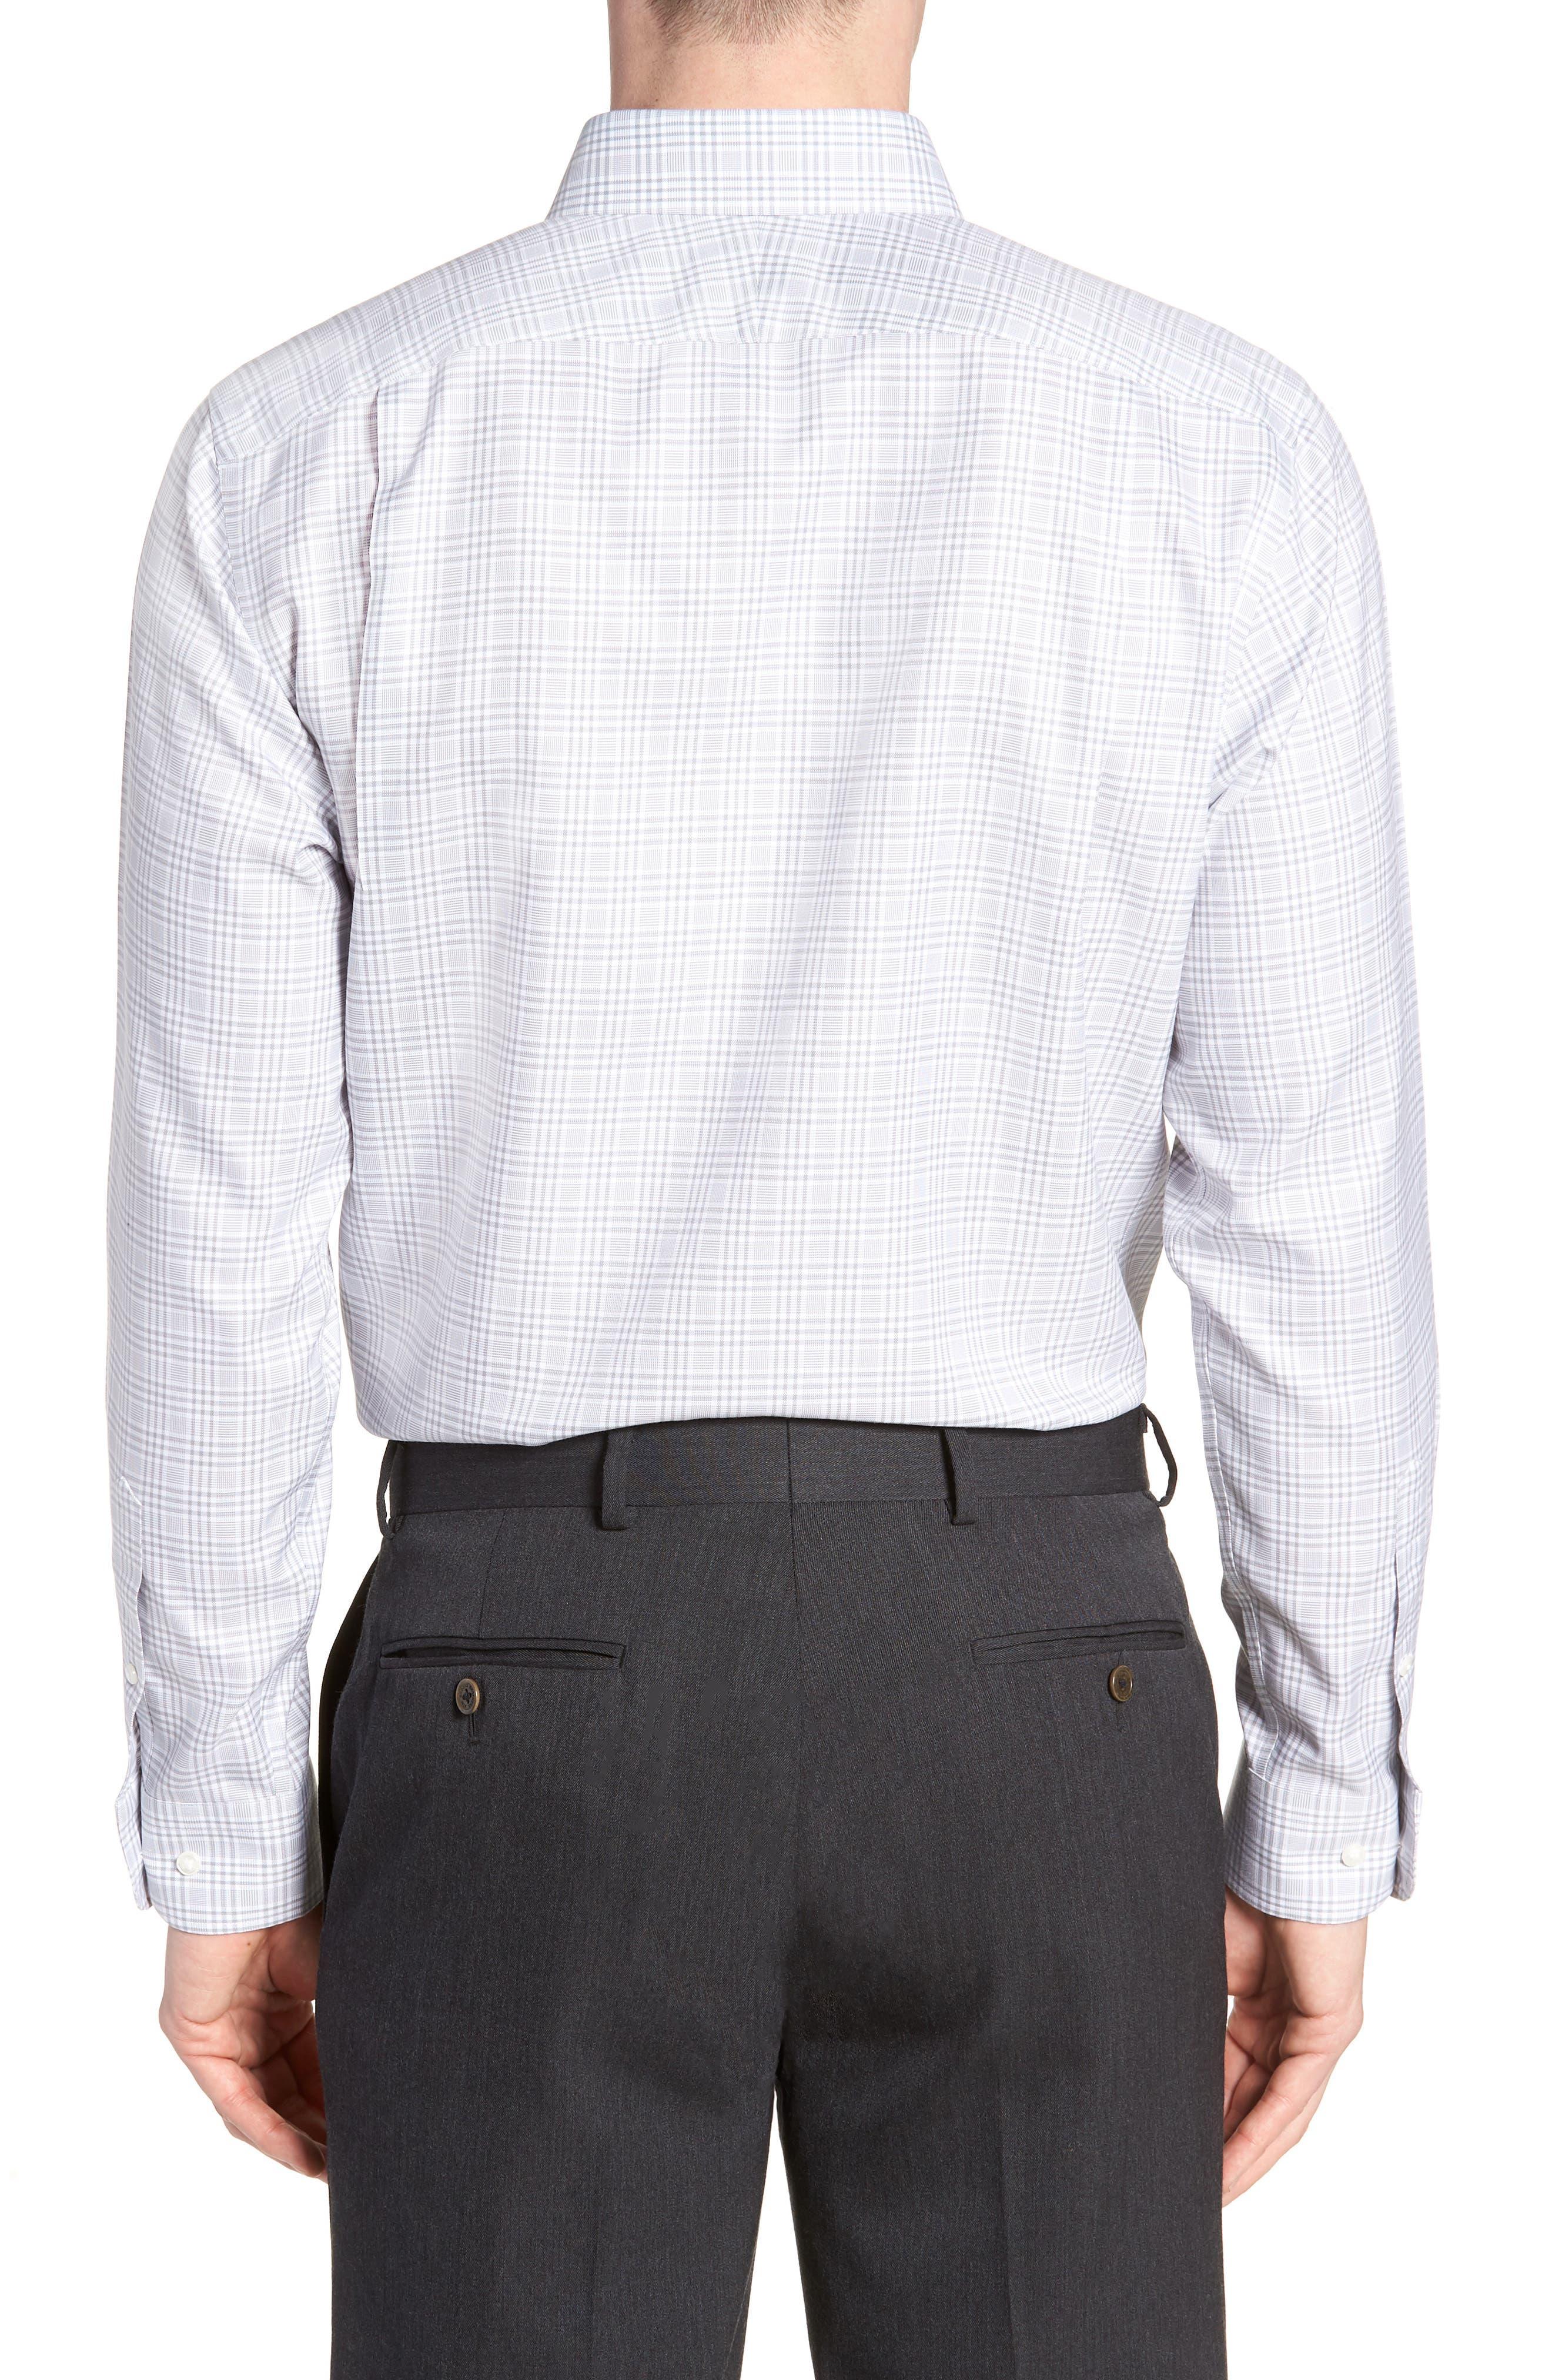 Smartcare<sup>™</sup> Traditional Fit Plaid Dress Shirt,                             Alternate thumbnail 3, color,                             Grey Sleet